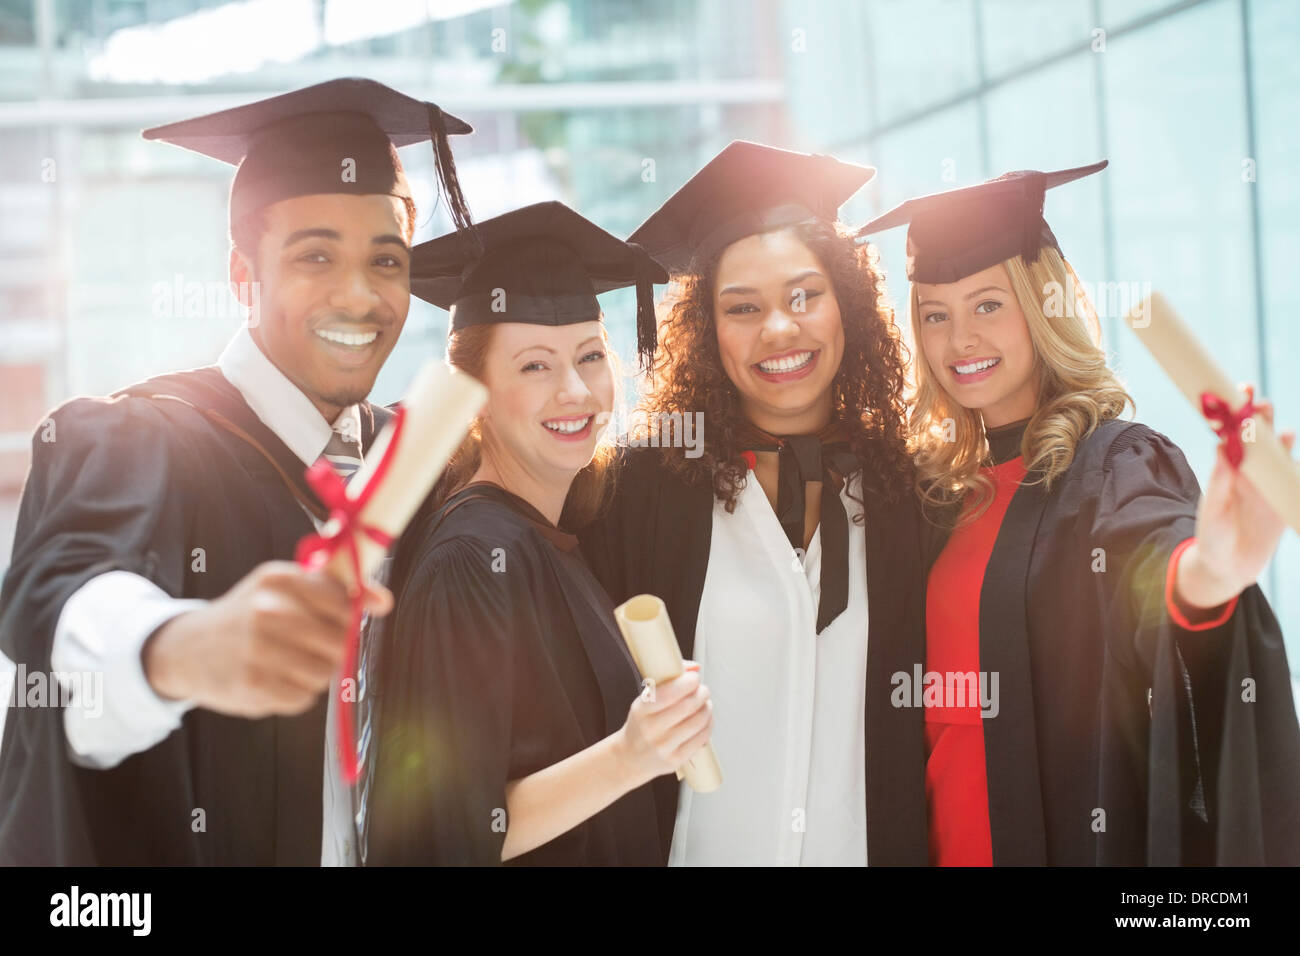 Graduates smiling with diploma - Stock Image